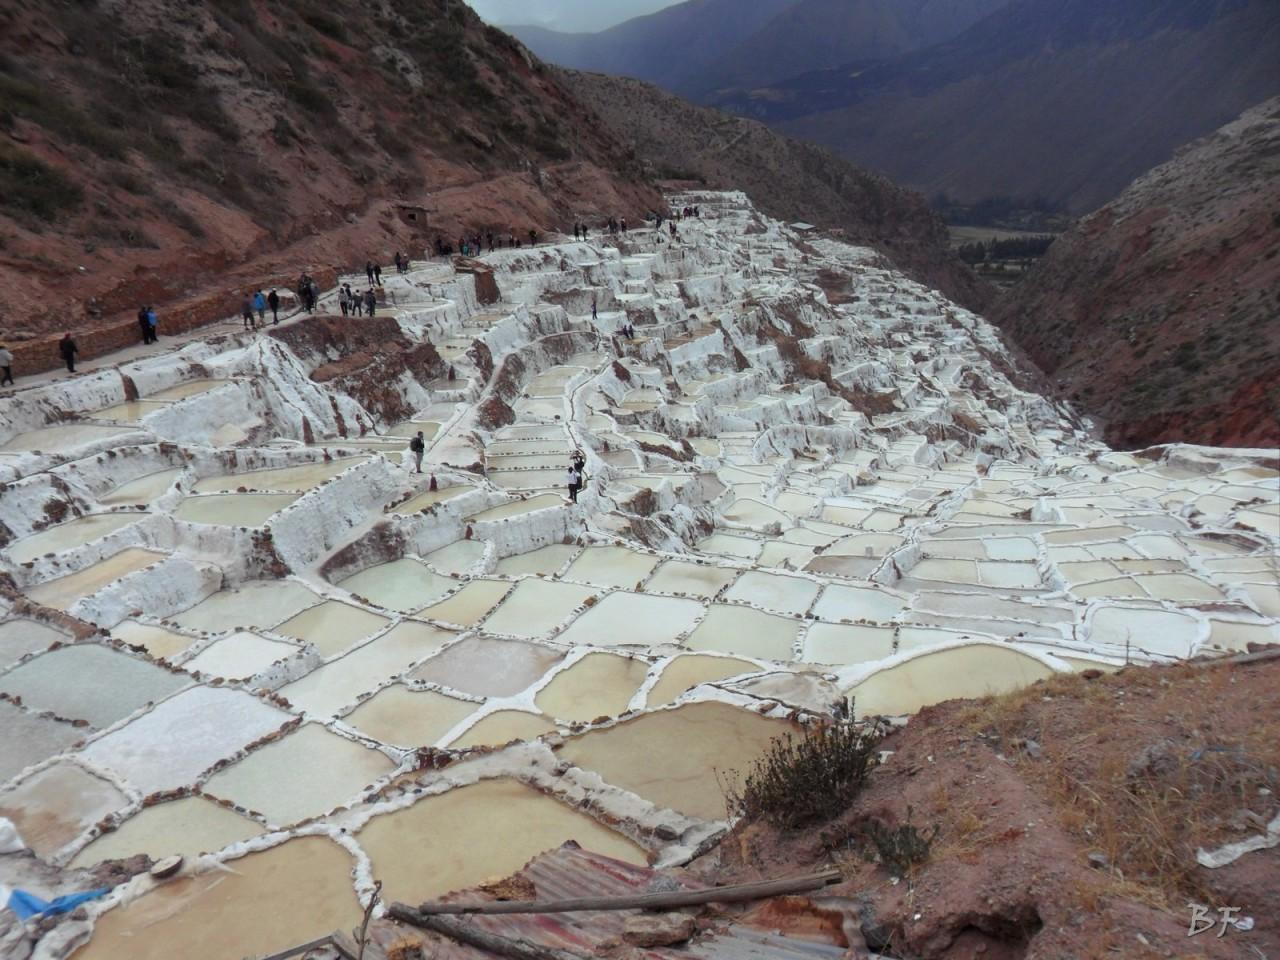 Terrazze-Circolari-Megaliti-Moray-Saline-Maras-Cusco-Perù-10